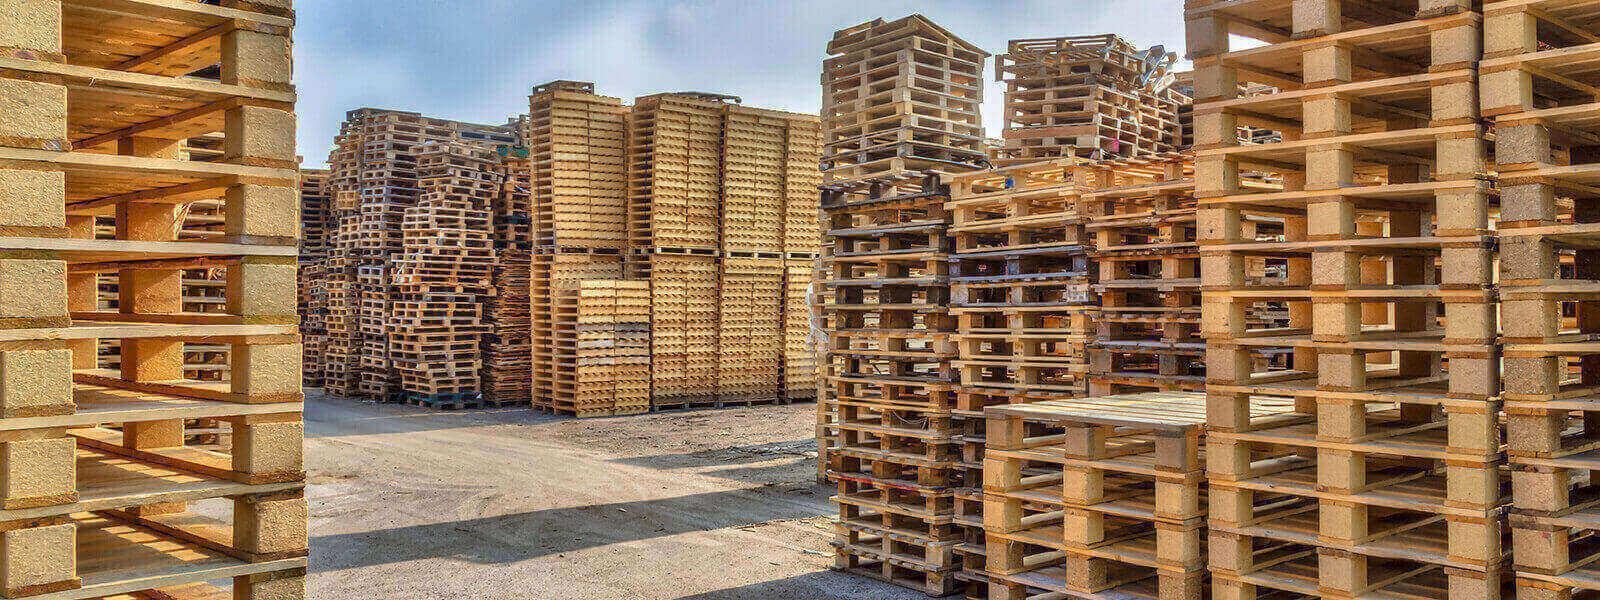 returnable transport items_pallets